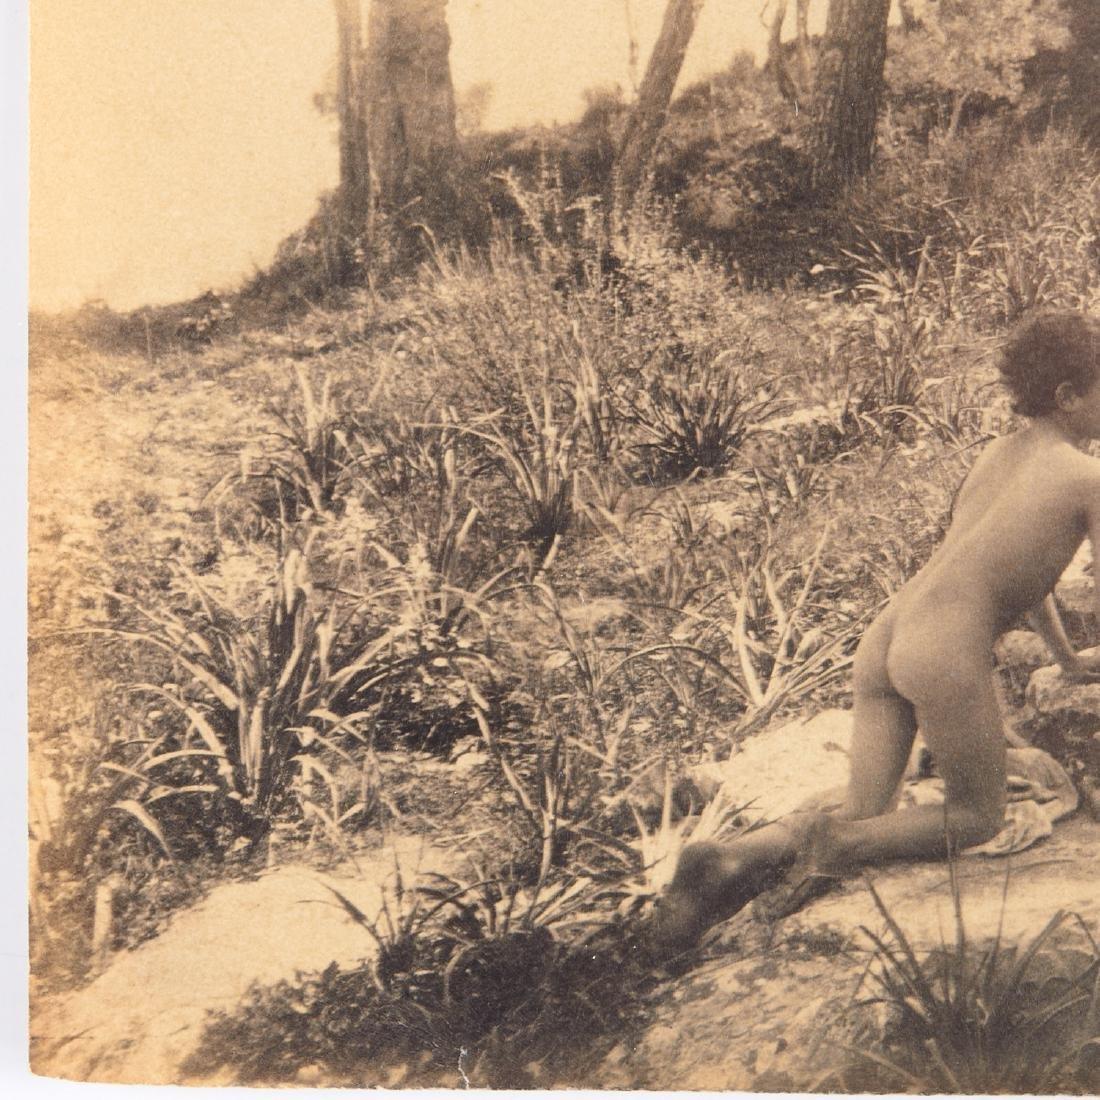 Guglielmo Pluschow, photograph - 2